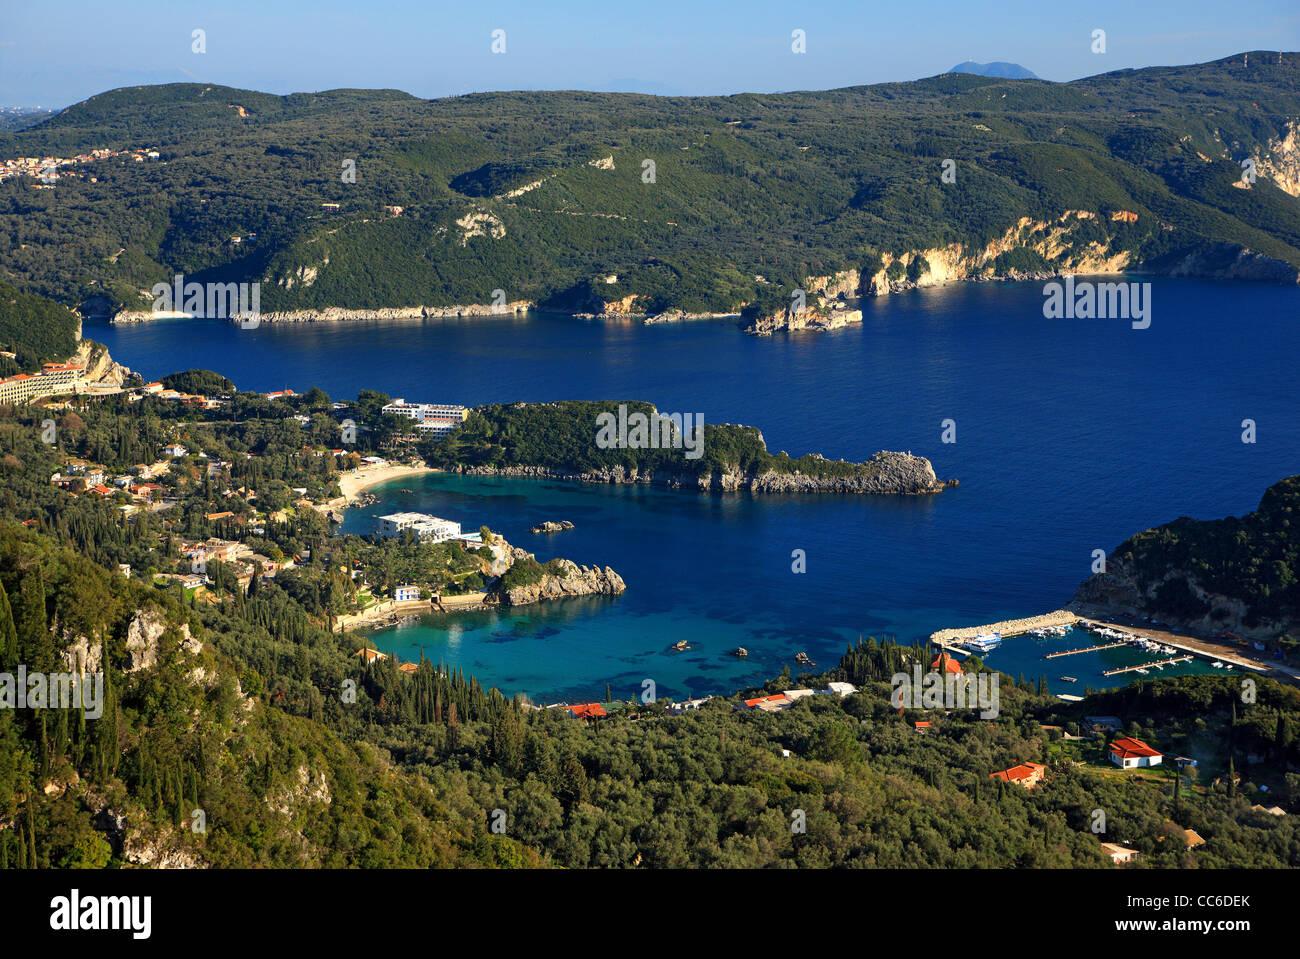 Some of the small bays in Paleokastritsa, famous tourist resort in Corfu (Kerkyra) island, Ionian sea, Greece Stock Photo